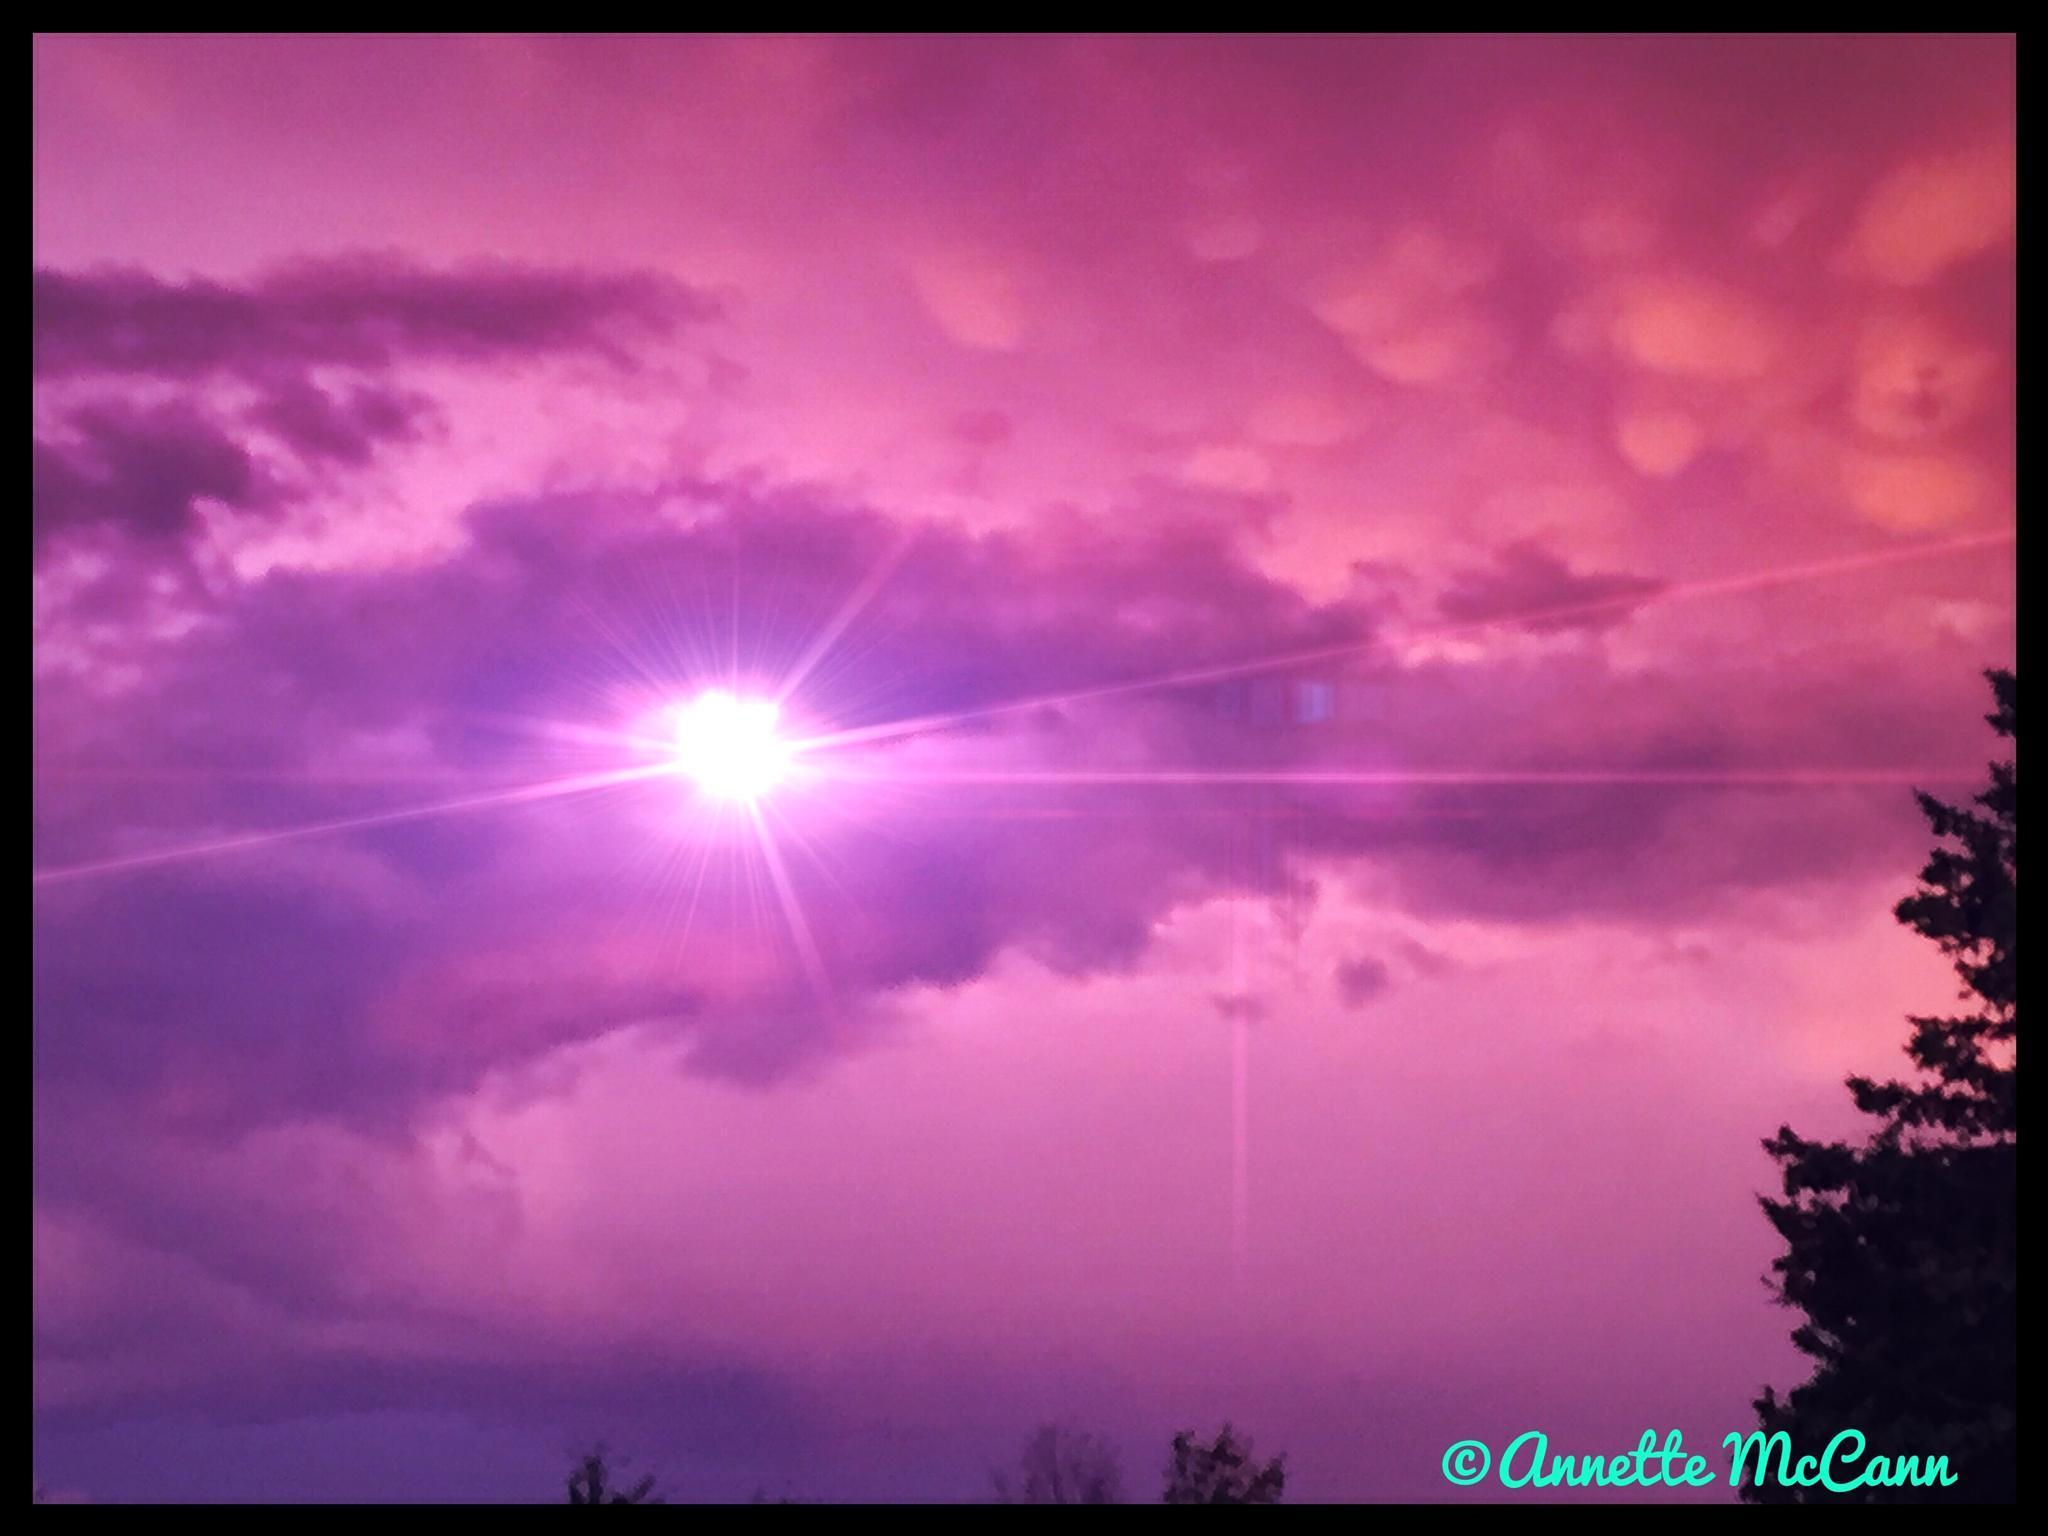 Clouds by Annette McCann